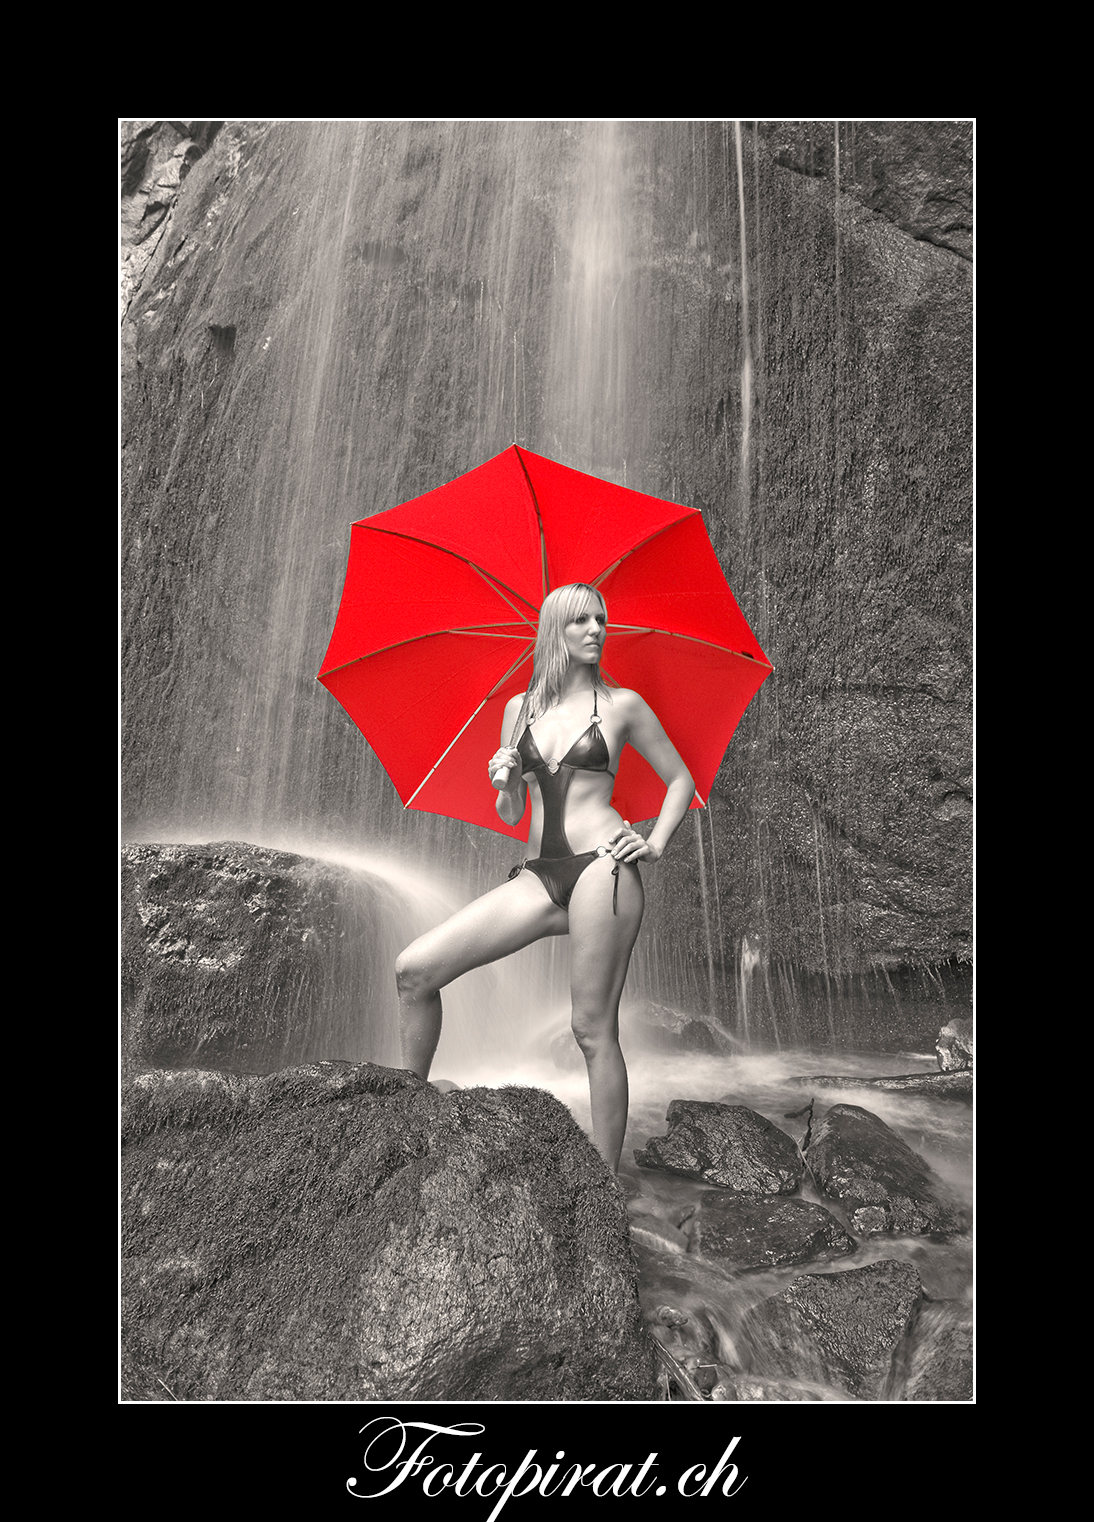 Wasserfall Fotoshooting, Monokini, Modelagentur, Sportmodel, eyecatcher, Fotomodel